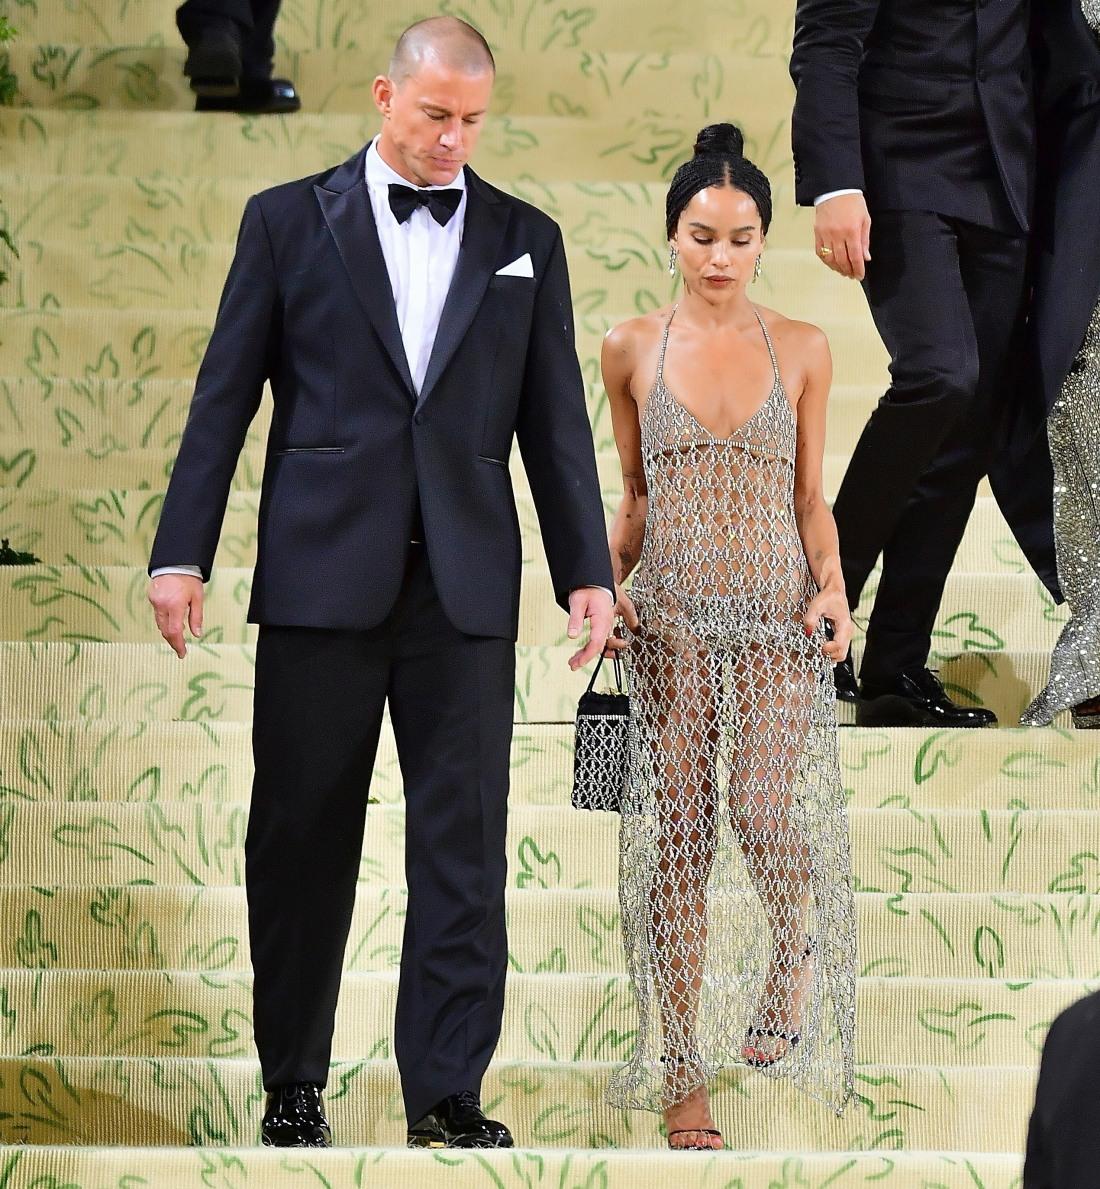 Channing Tatum and Zoe Kravitz leave the MET Gala hand in hand